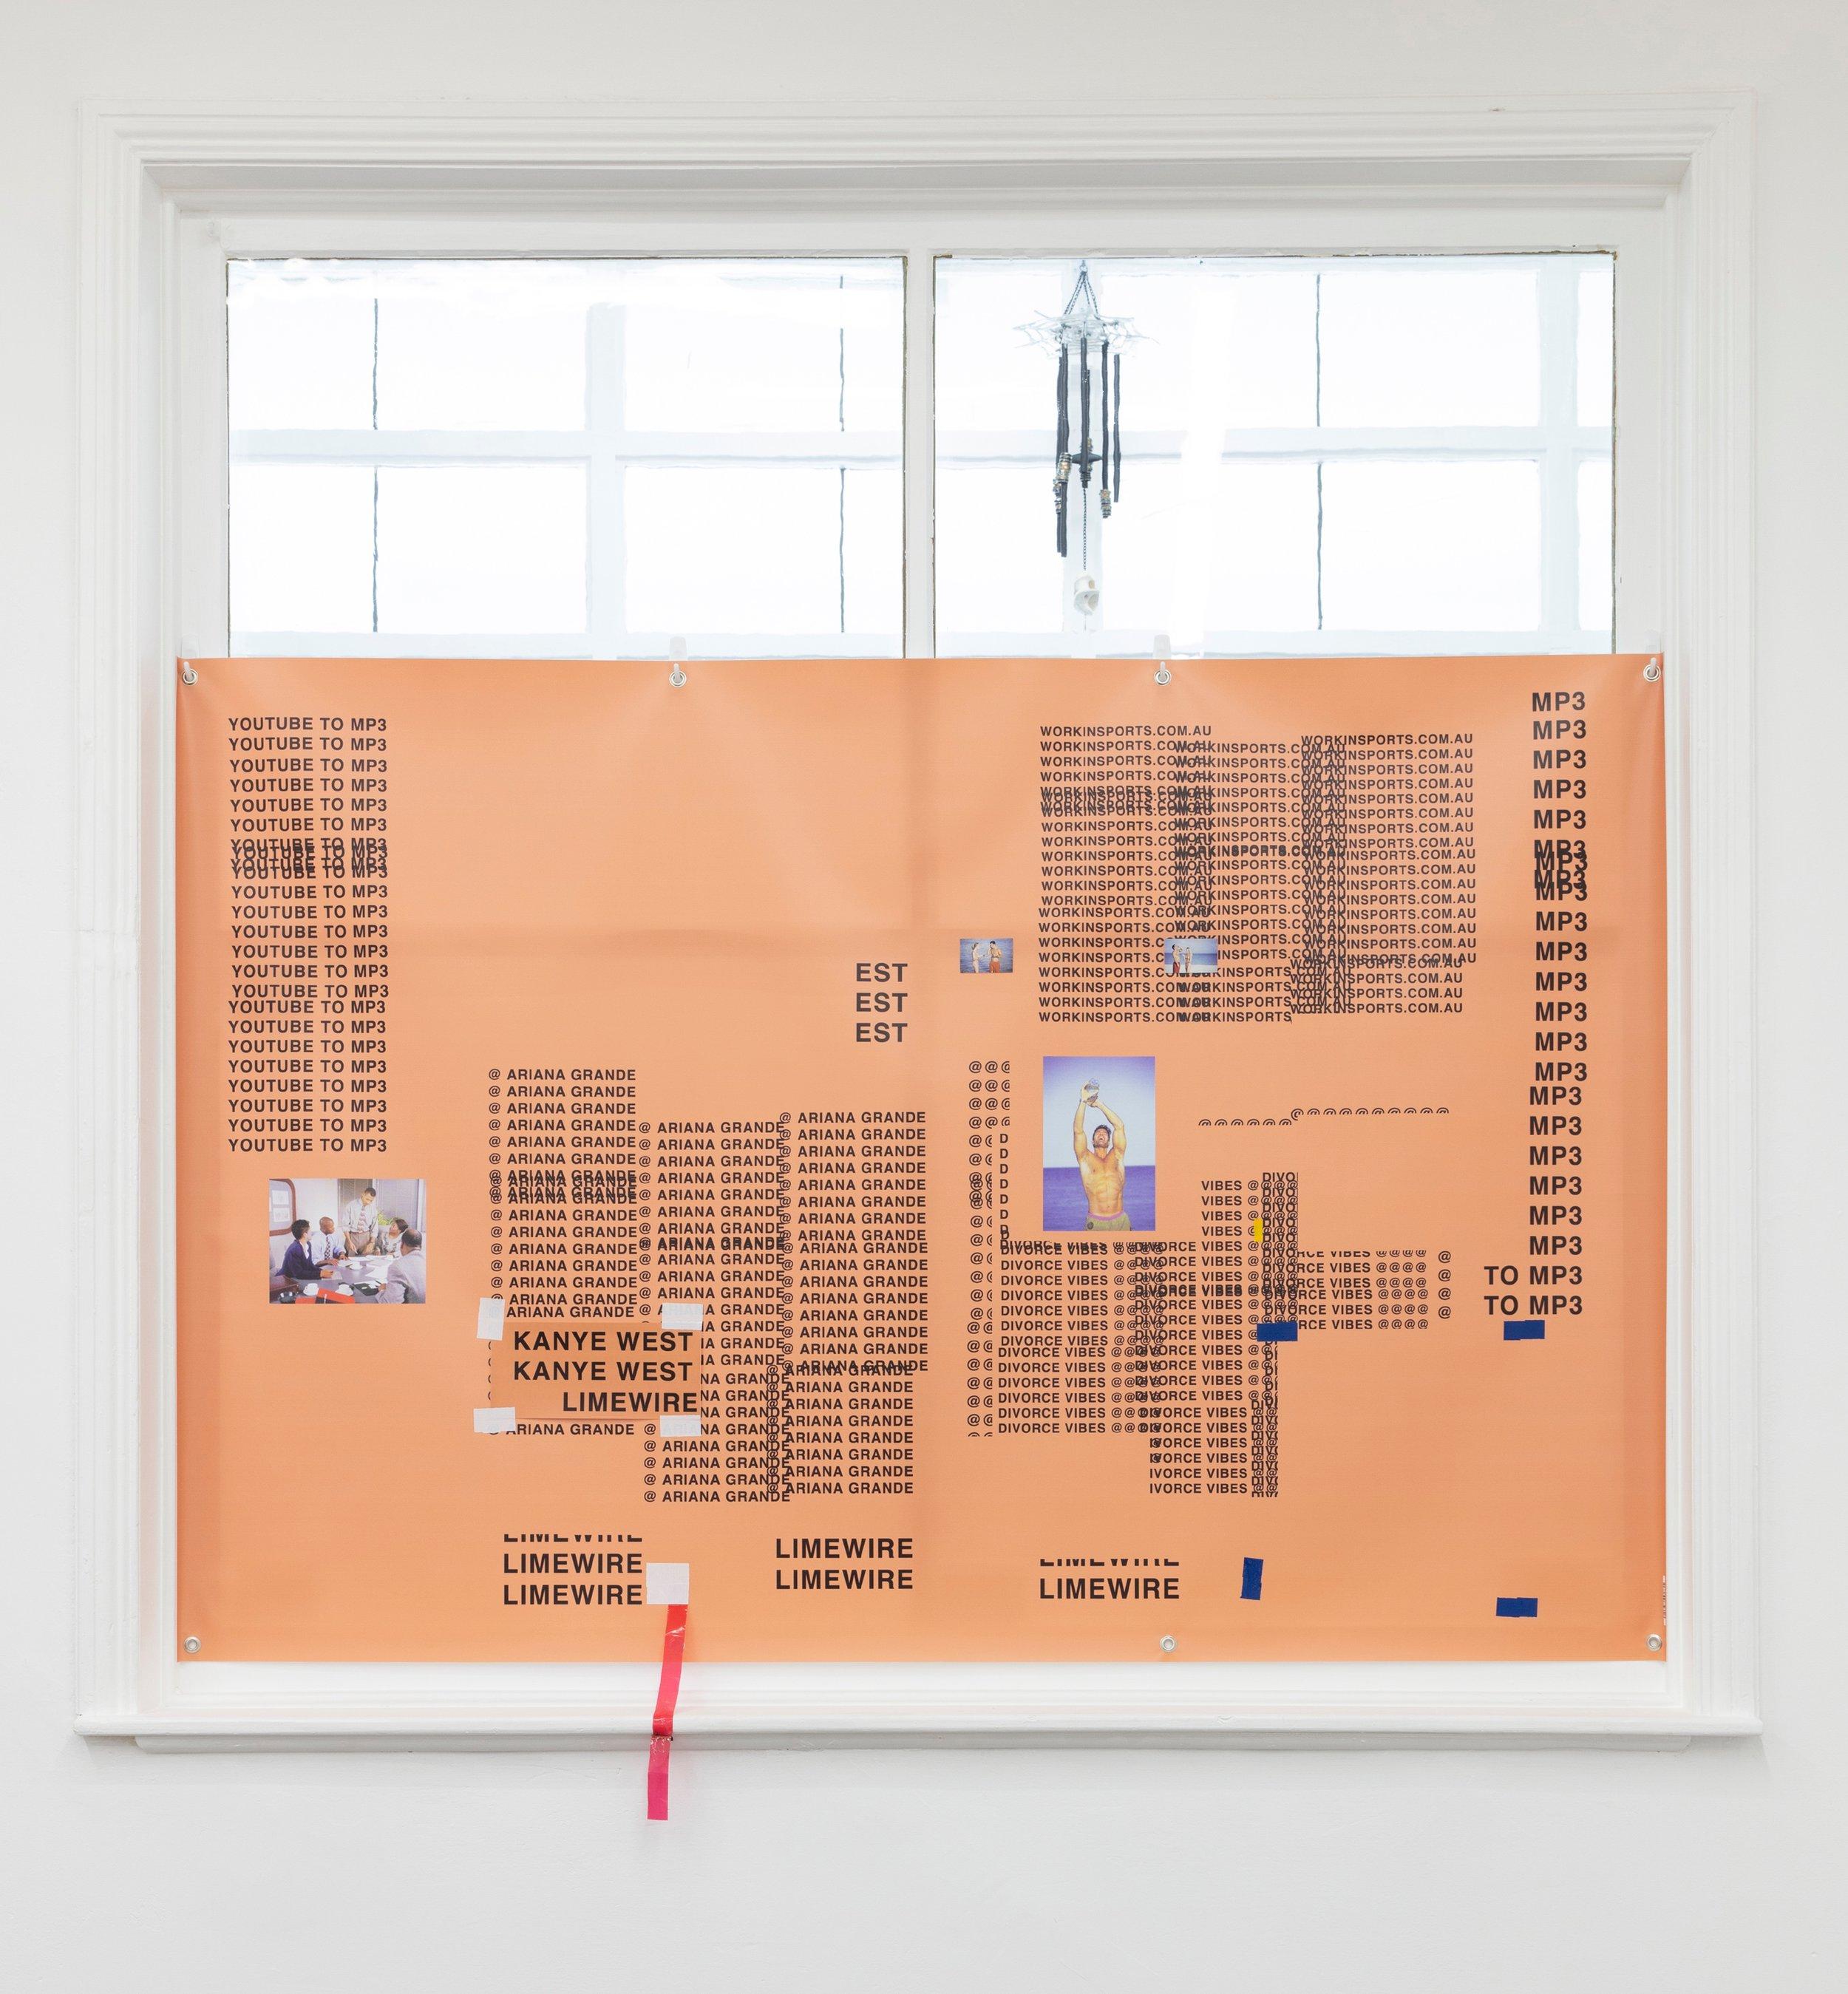 Image: Matt Brown, Divorce Vibes, 122 x 180 cm, 2018, Digital vinyl print and cloth tape, photography by Bo Wong